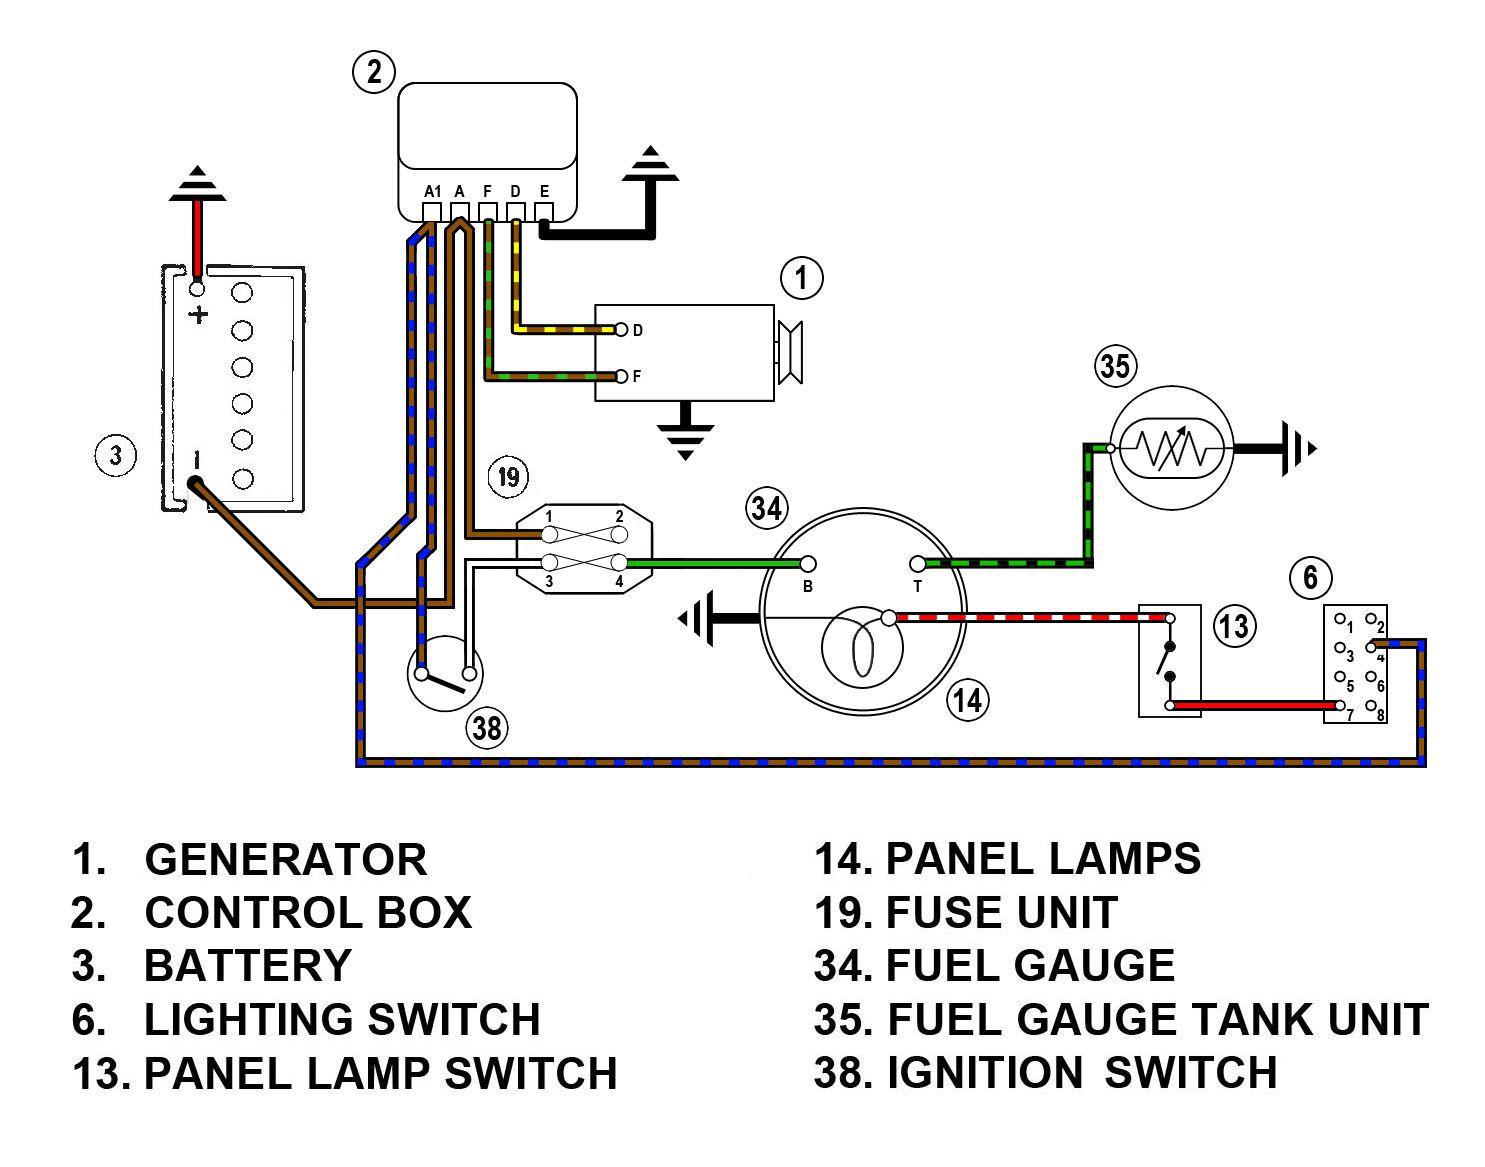 Fuel Sender Wiring Diagram Library Wiring Diagram Fuel Sender